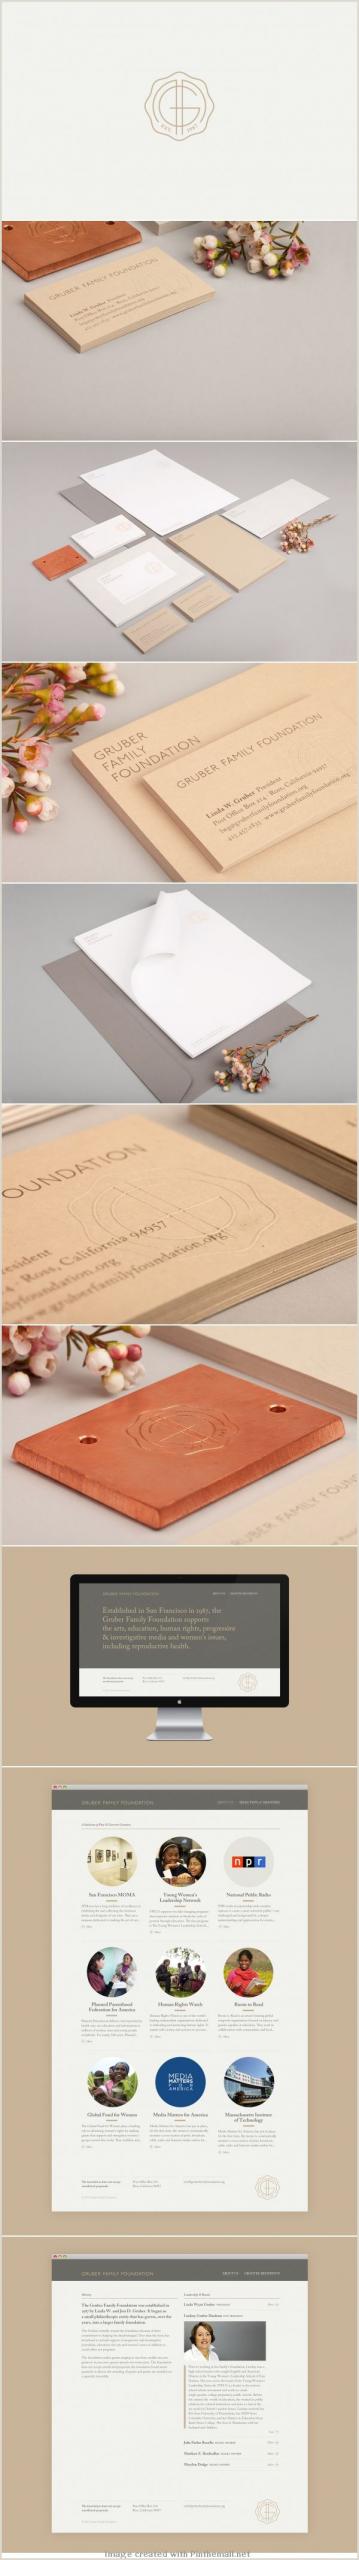 Simple Business Cards 14 Popular Hardwood Flooring Business Card Template